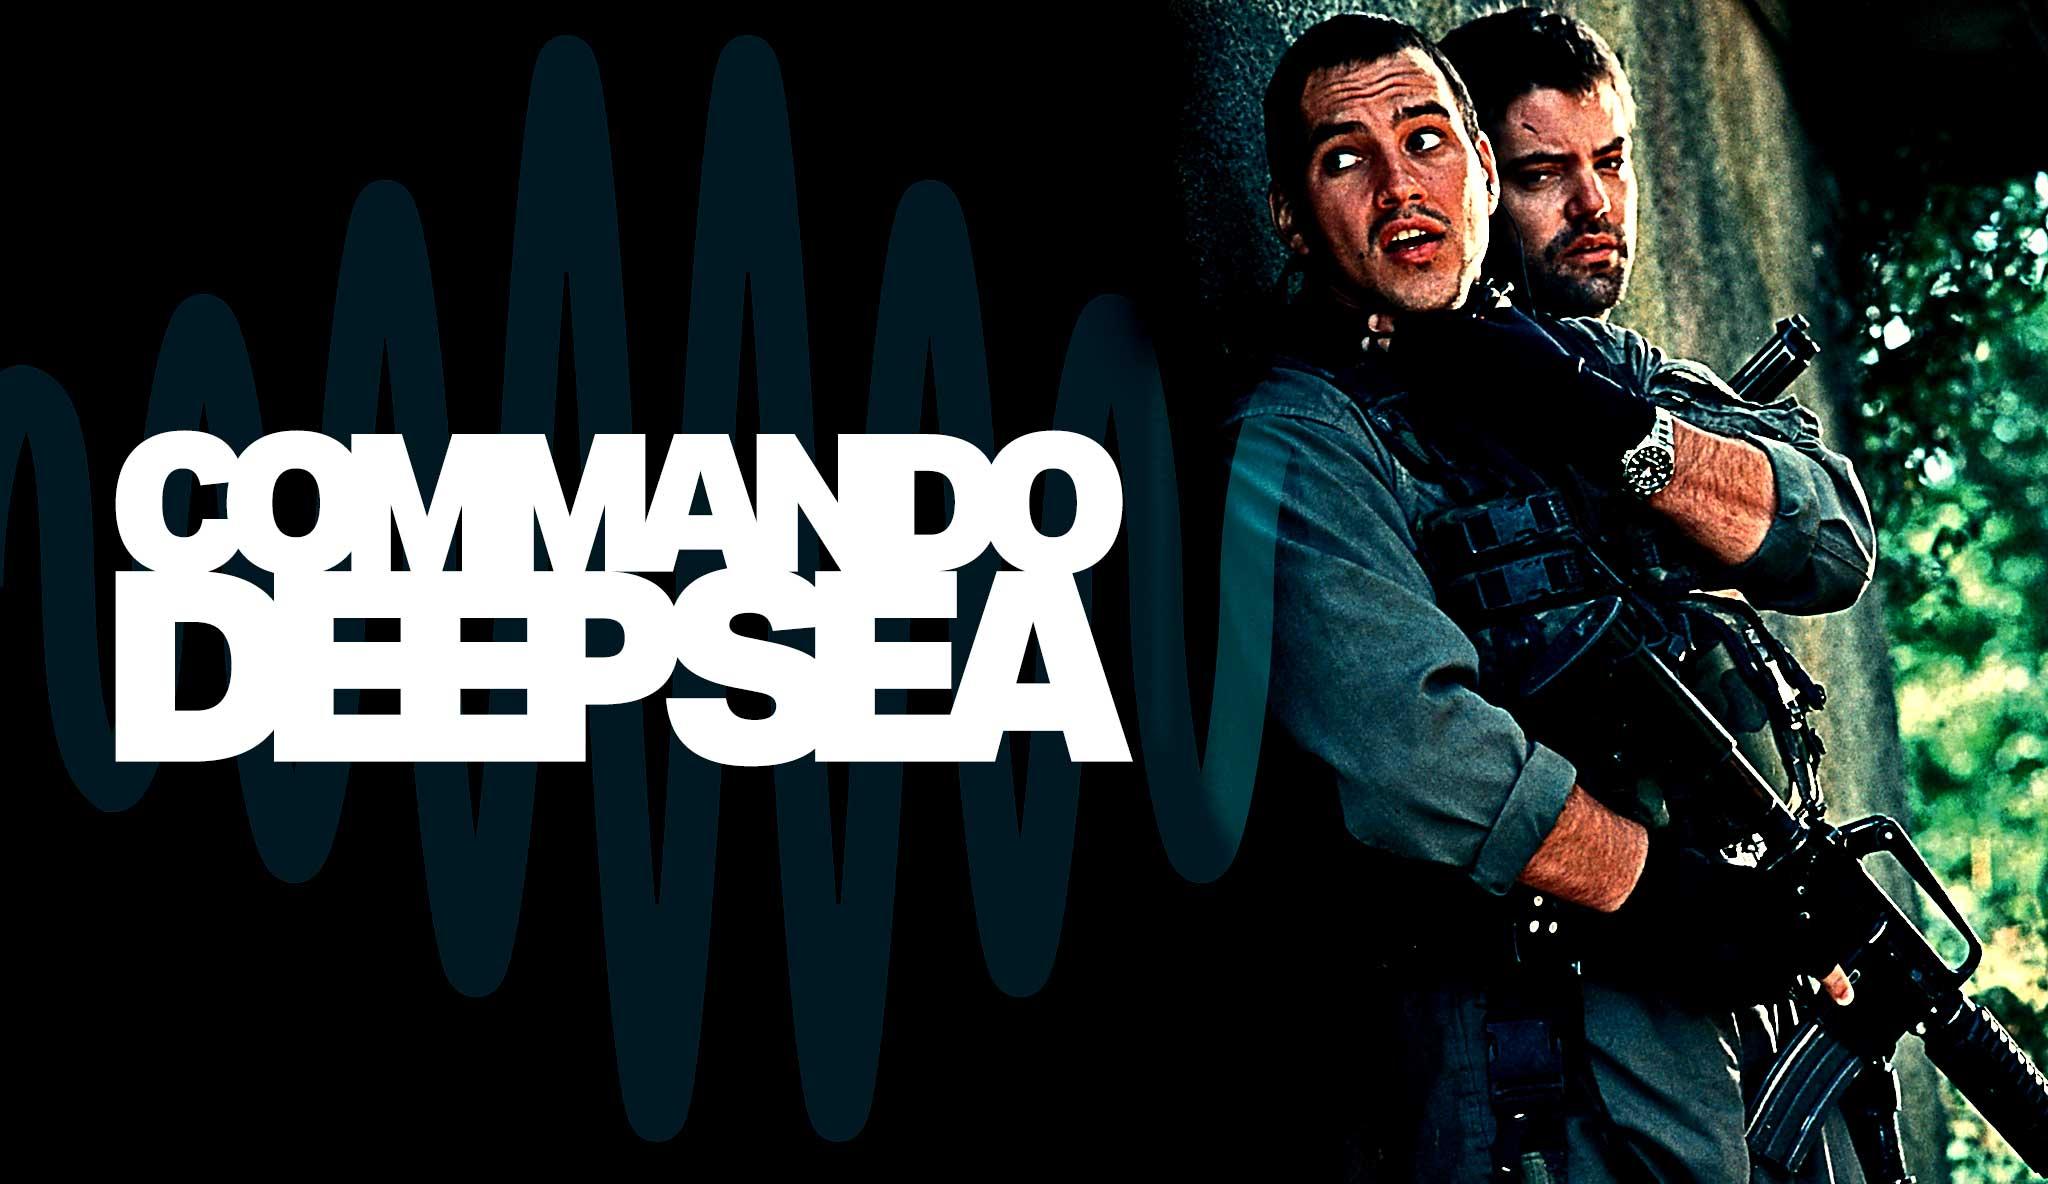 commando-deep-sea\header.jpg